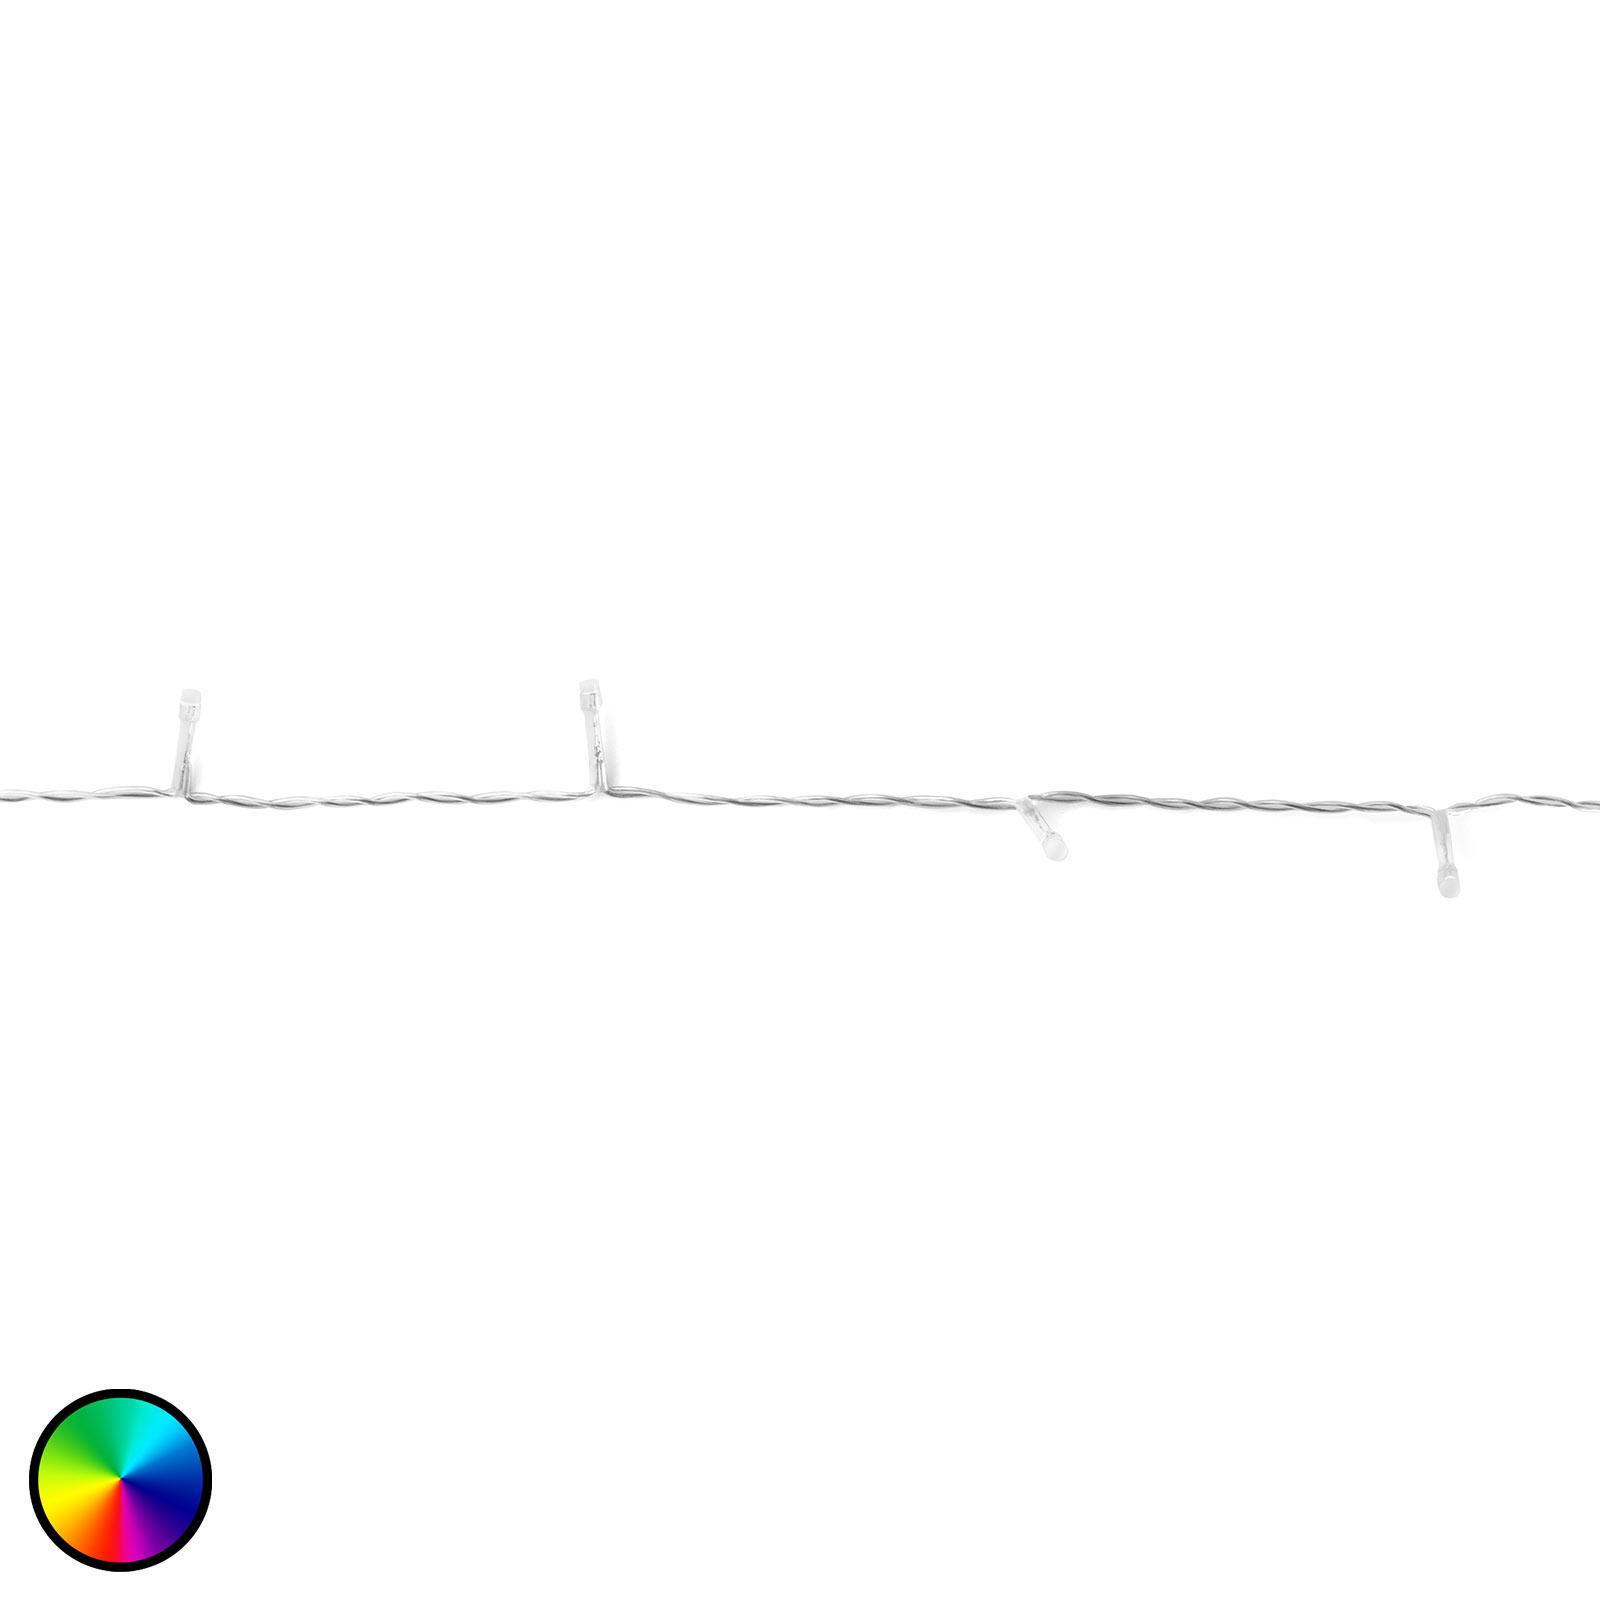 Acquista Catena luminosa Twinkly RGBW, 250 luci